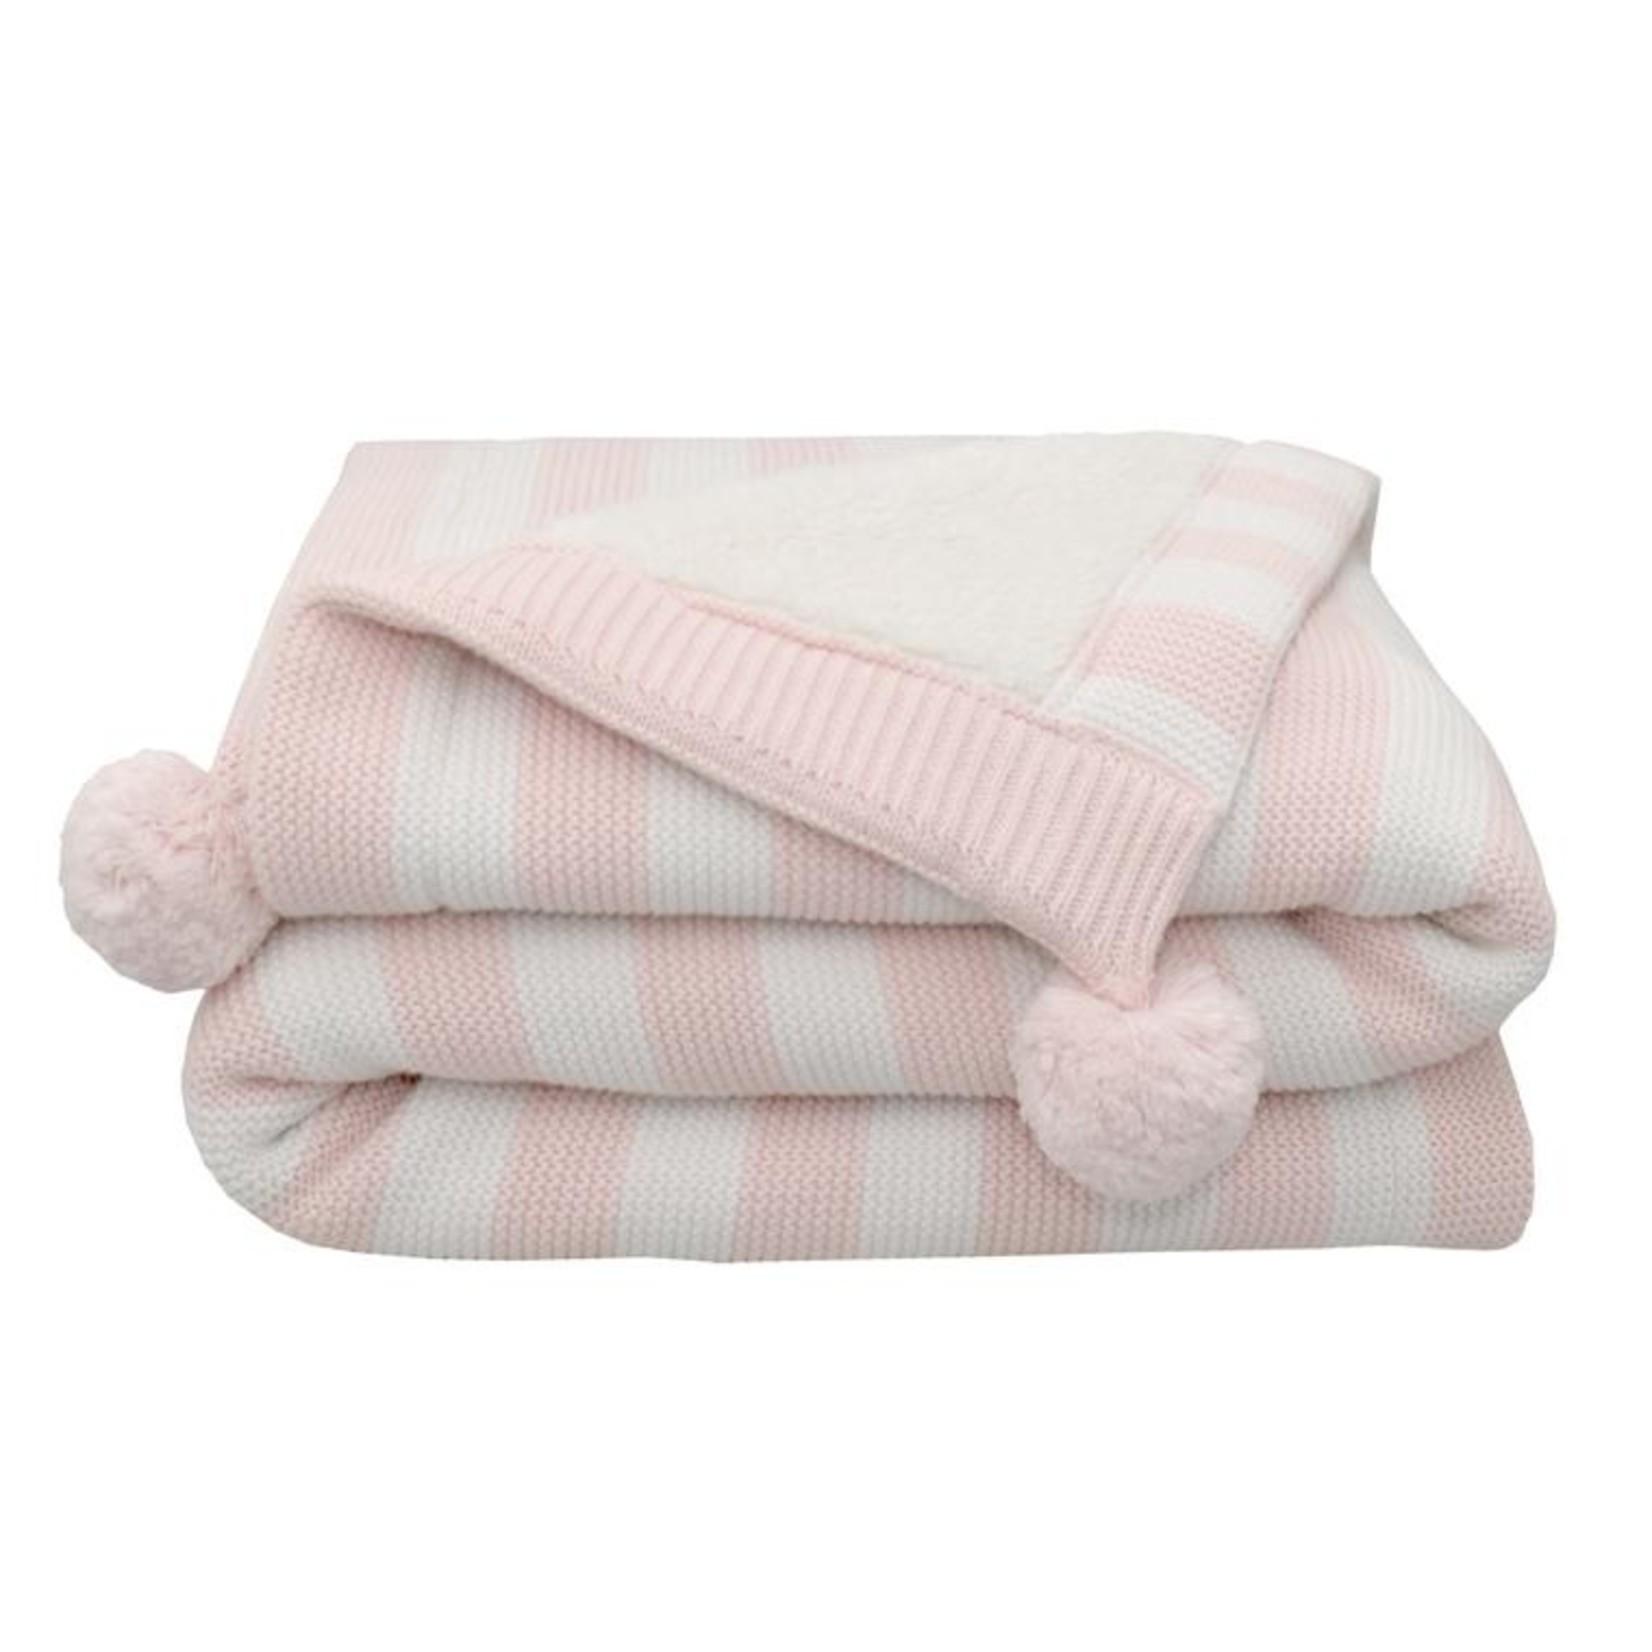 Living Textiles Living Textiles Sherpa Blanket - Blush